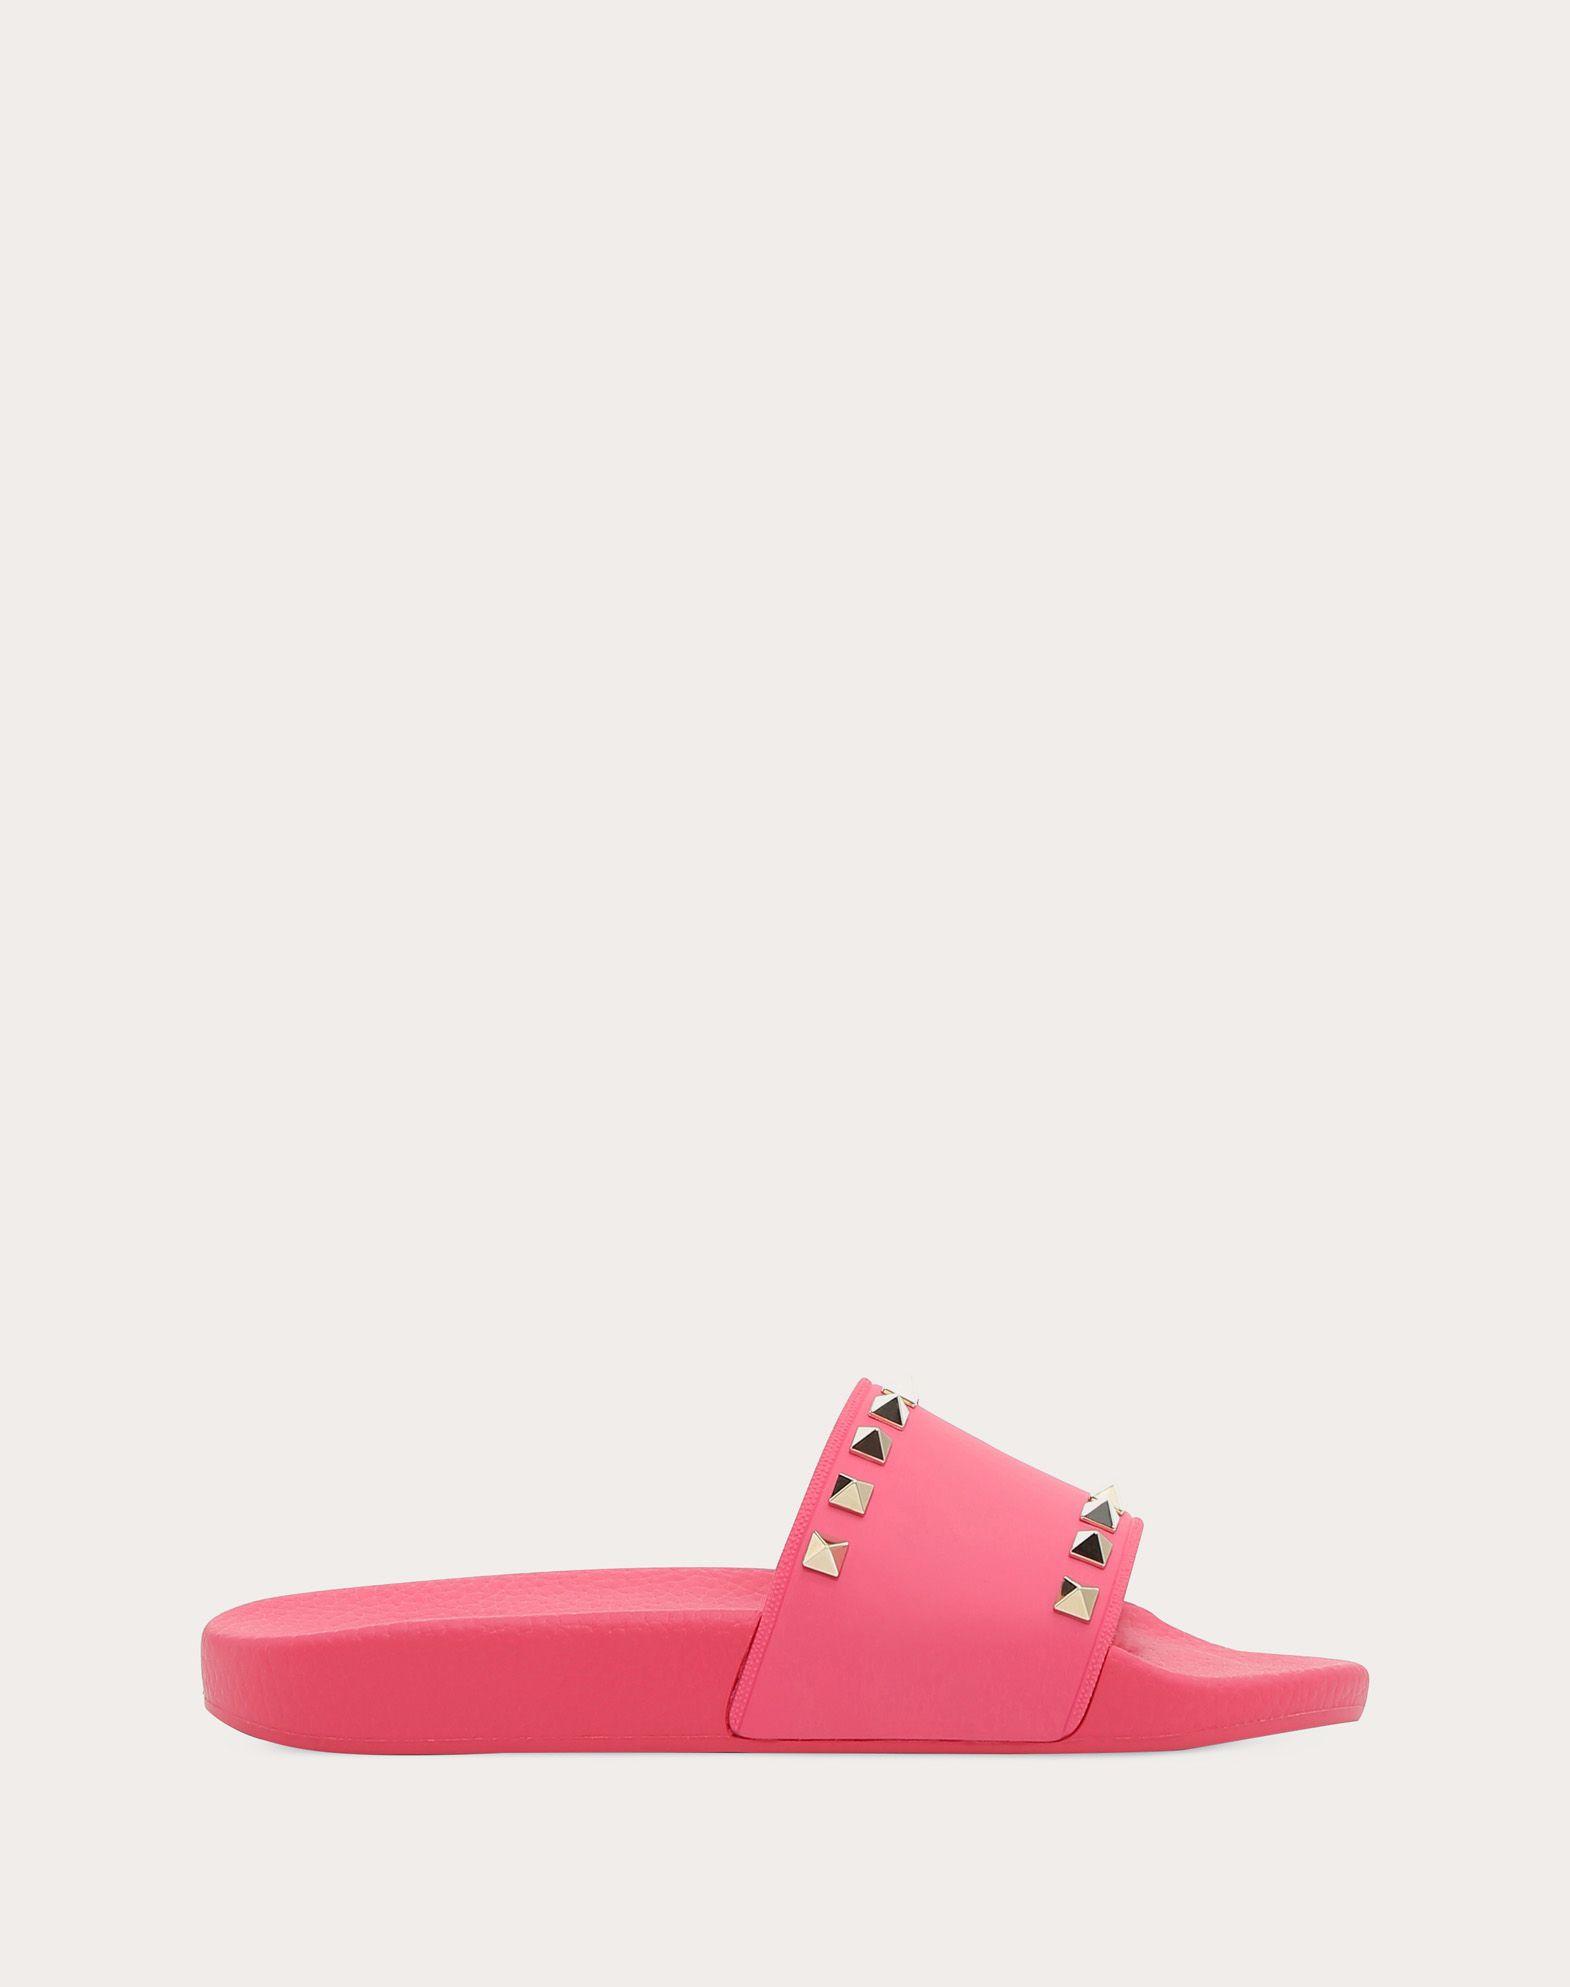 VALENTINO Studs Round toeline Solid color Rubber sole  45380917ta